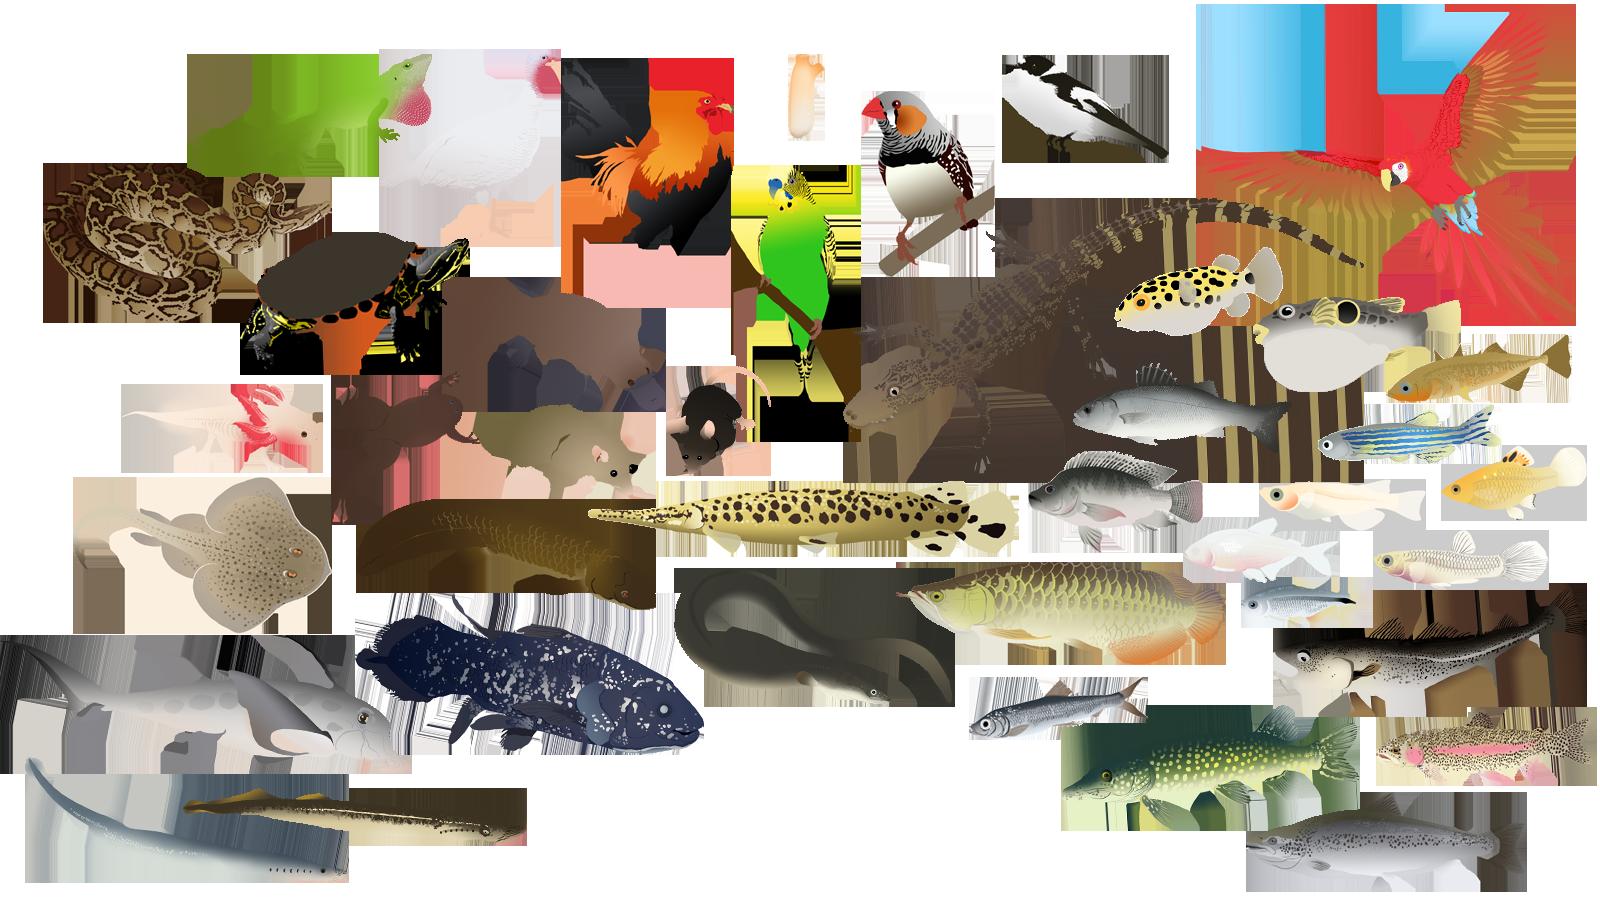 Jawless fish clipart jpg free stock Ego sum Daniel jpg free stock